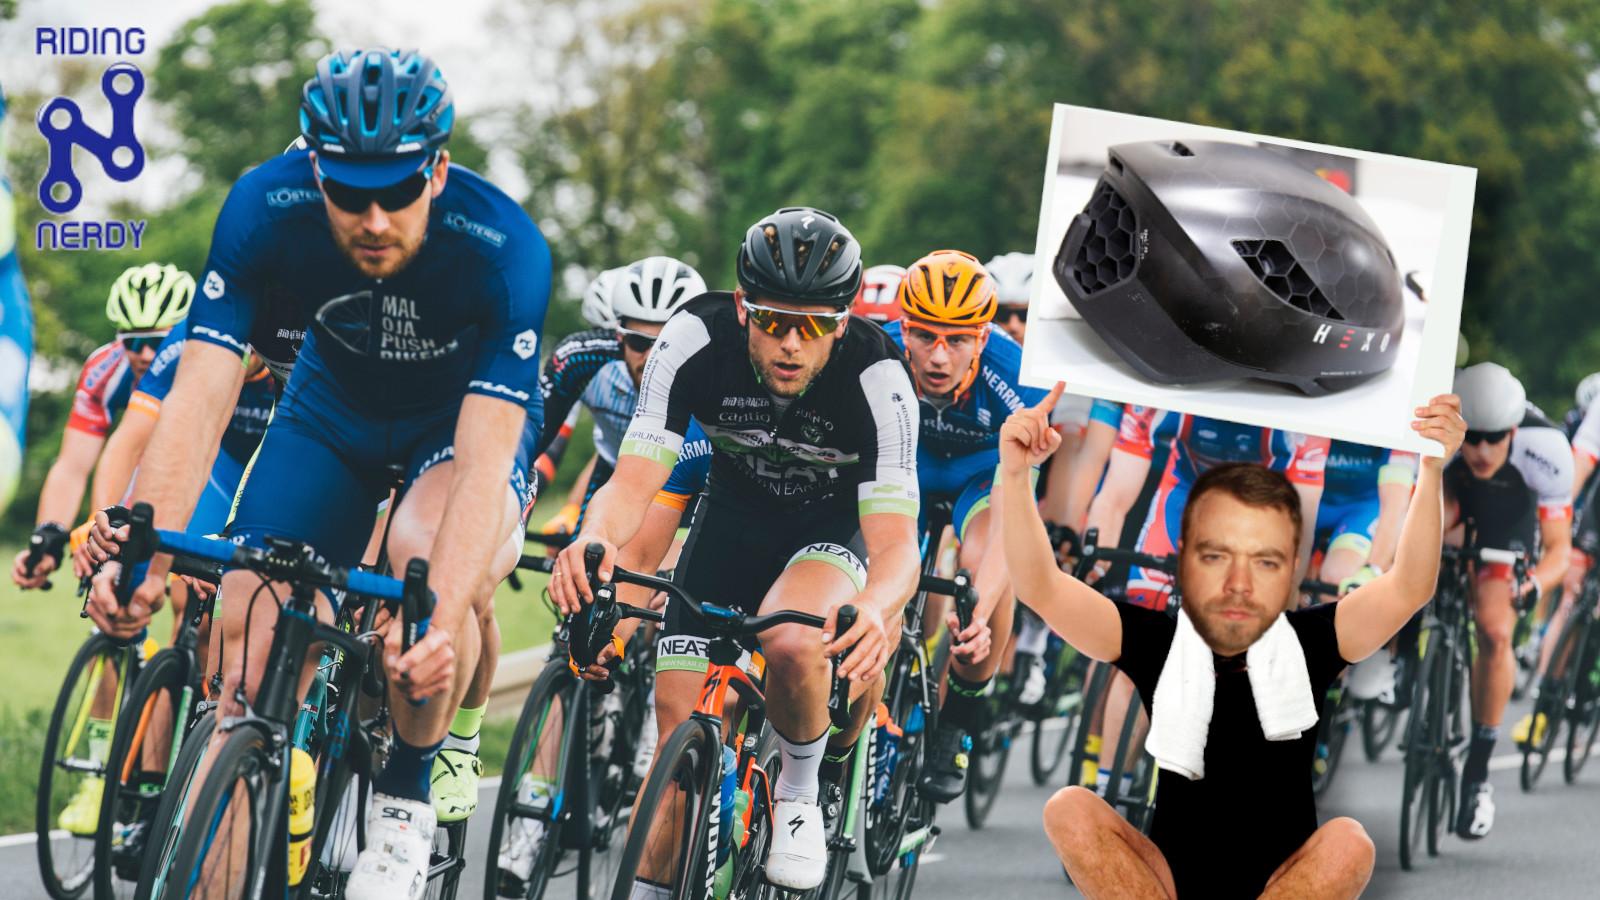 This custom 3D-printed bicycle helmet is the future of saving skulls